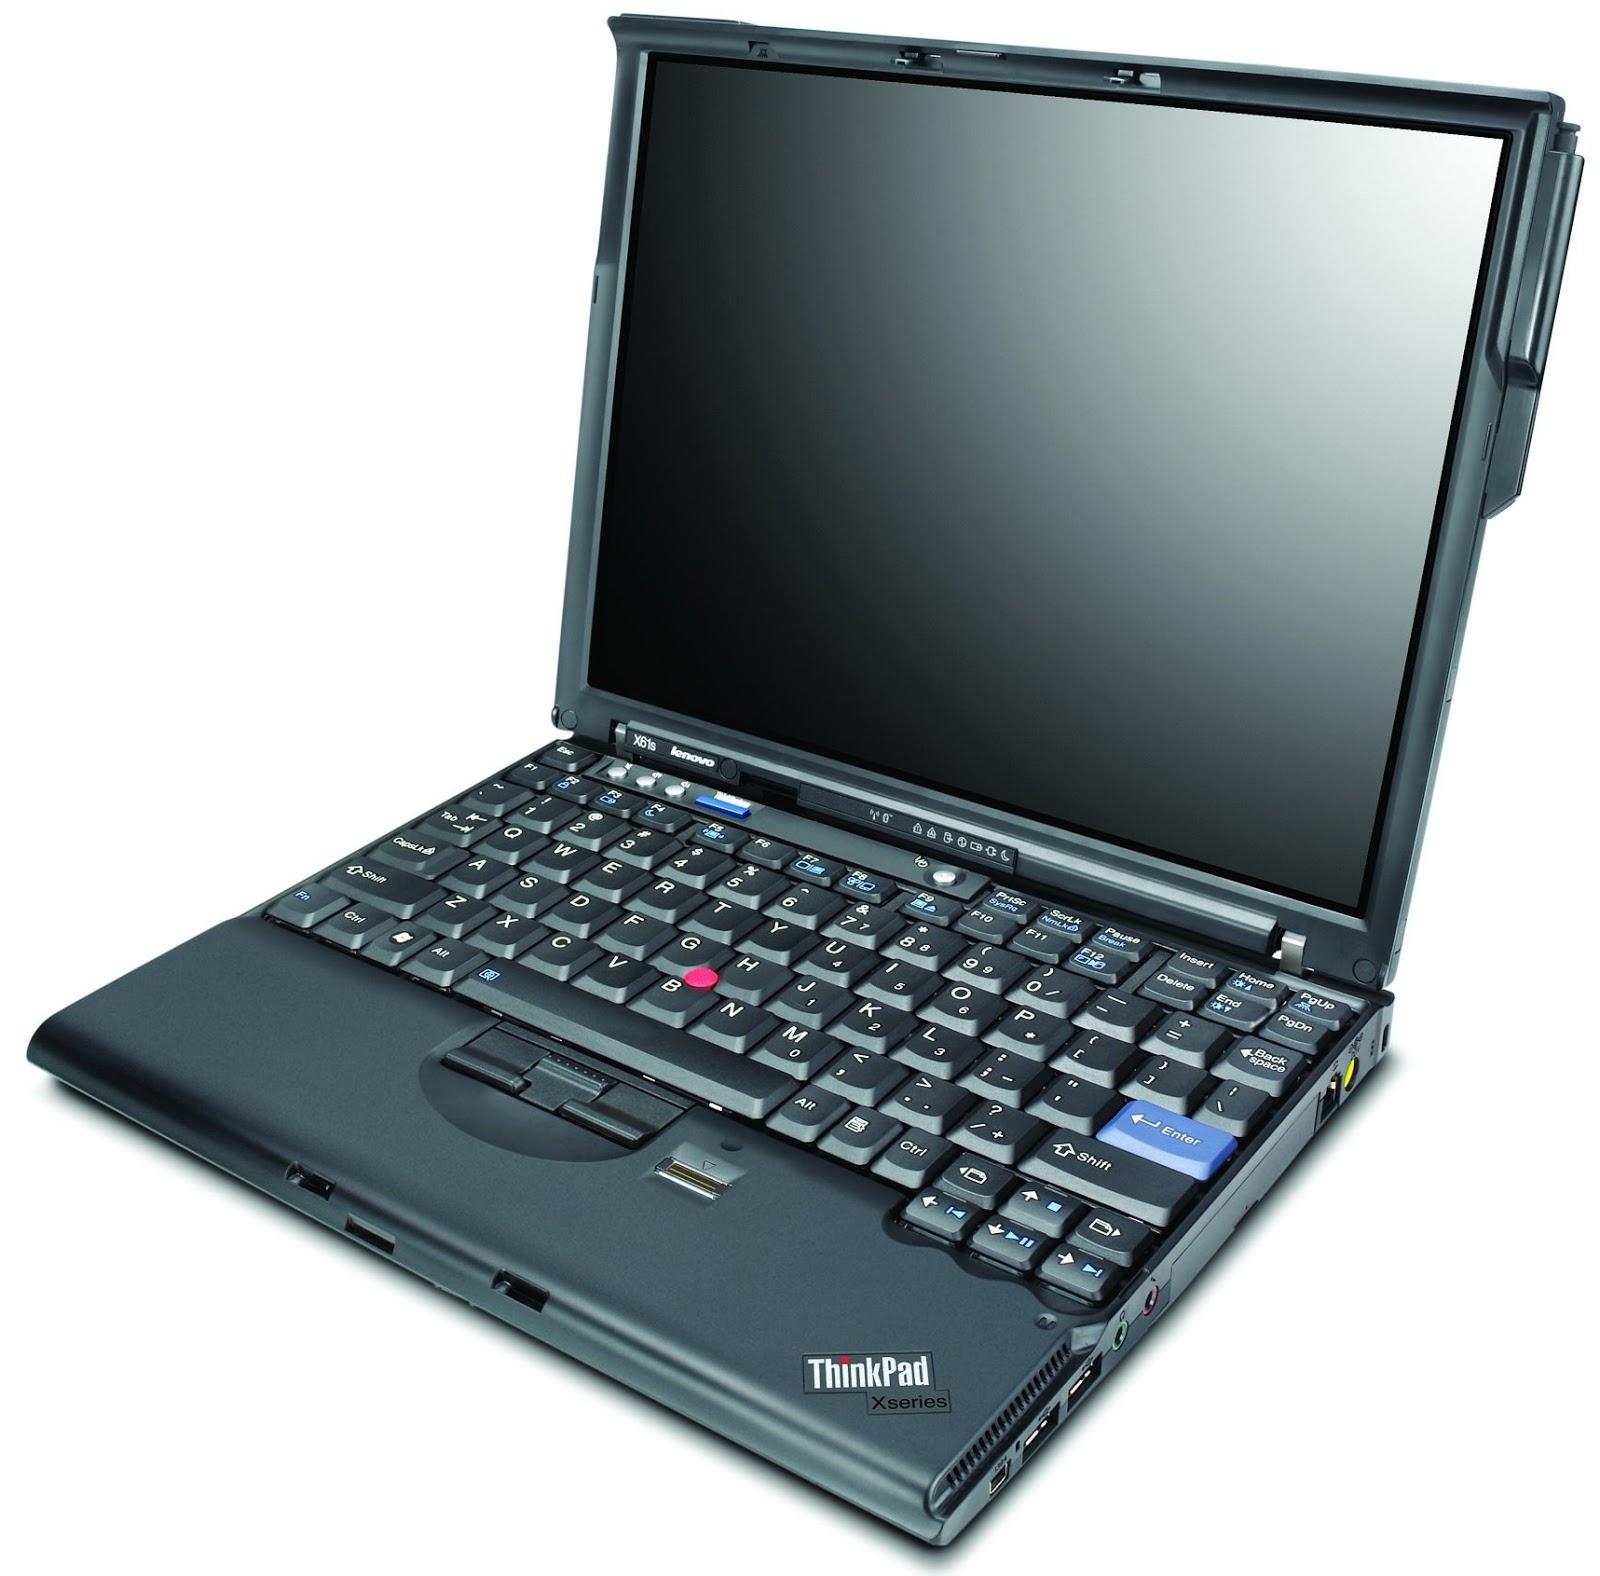 Lenovo ThinkPad T61 drivers for Windows 8